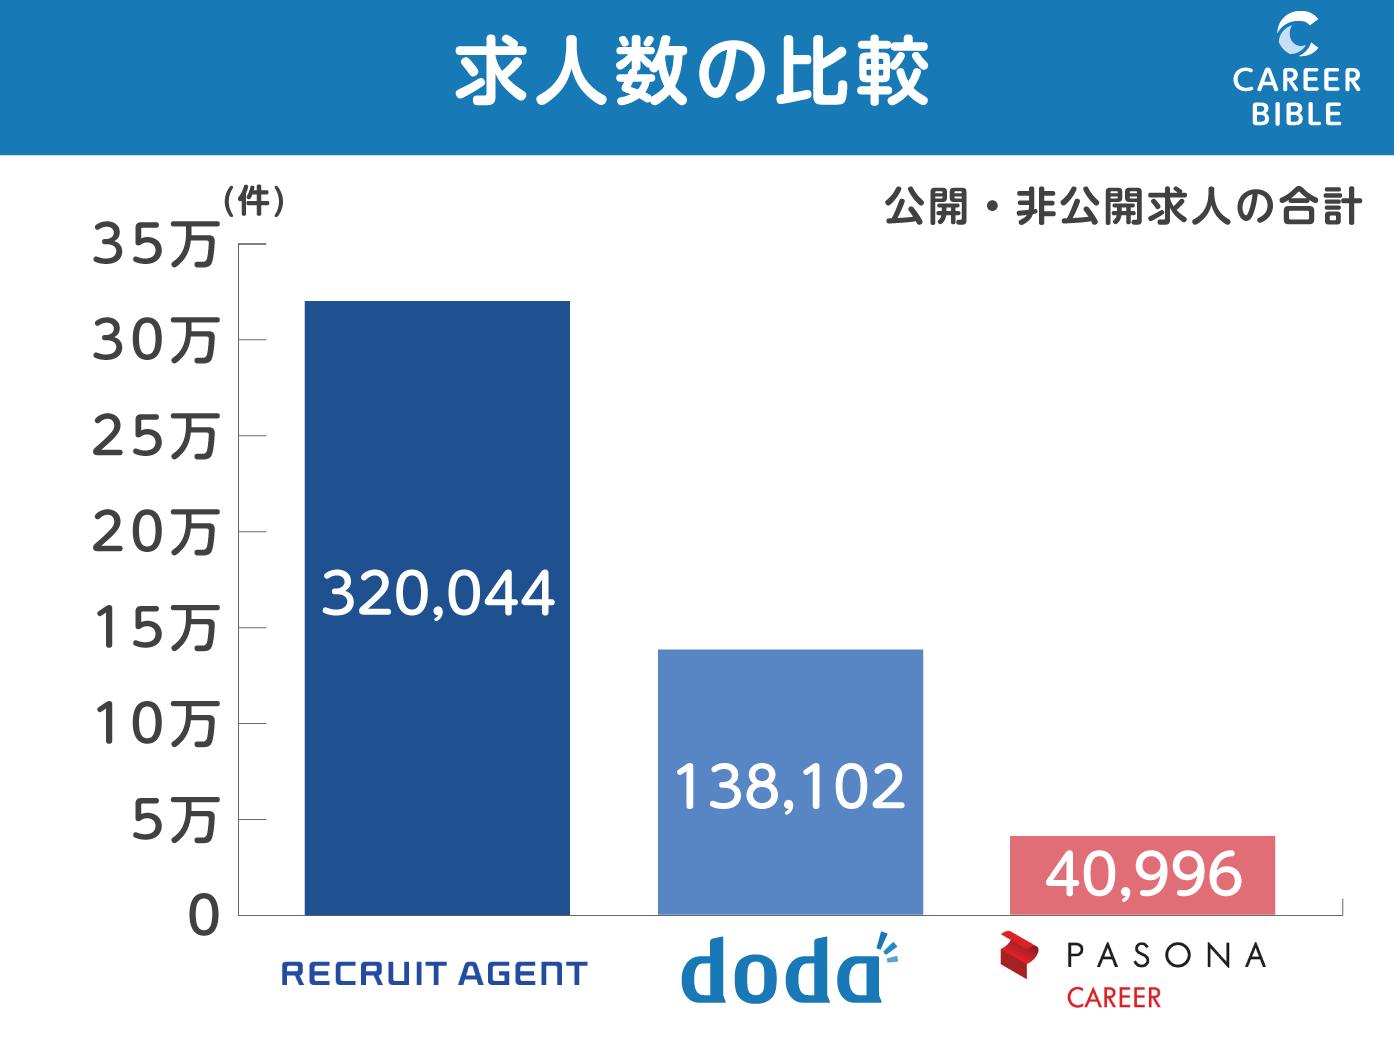 dodaとパソナキャリアの求人数比較